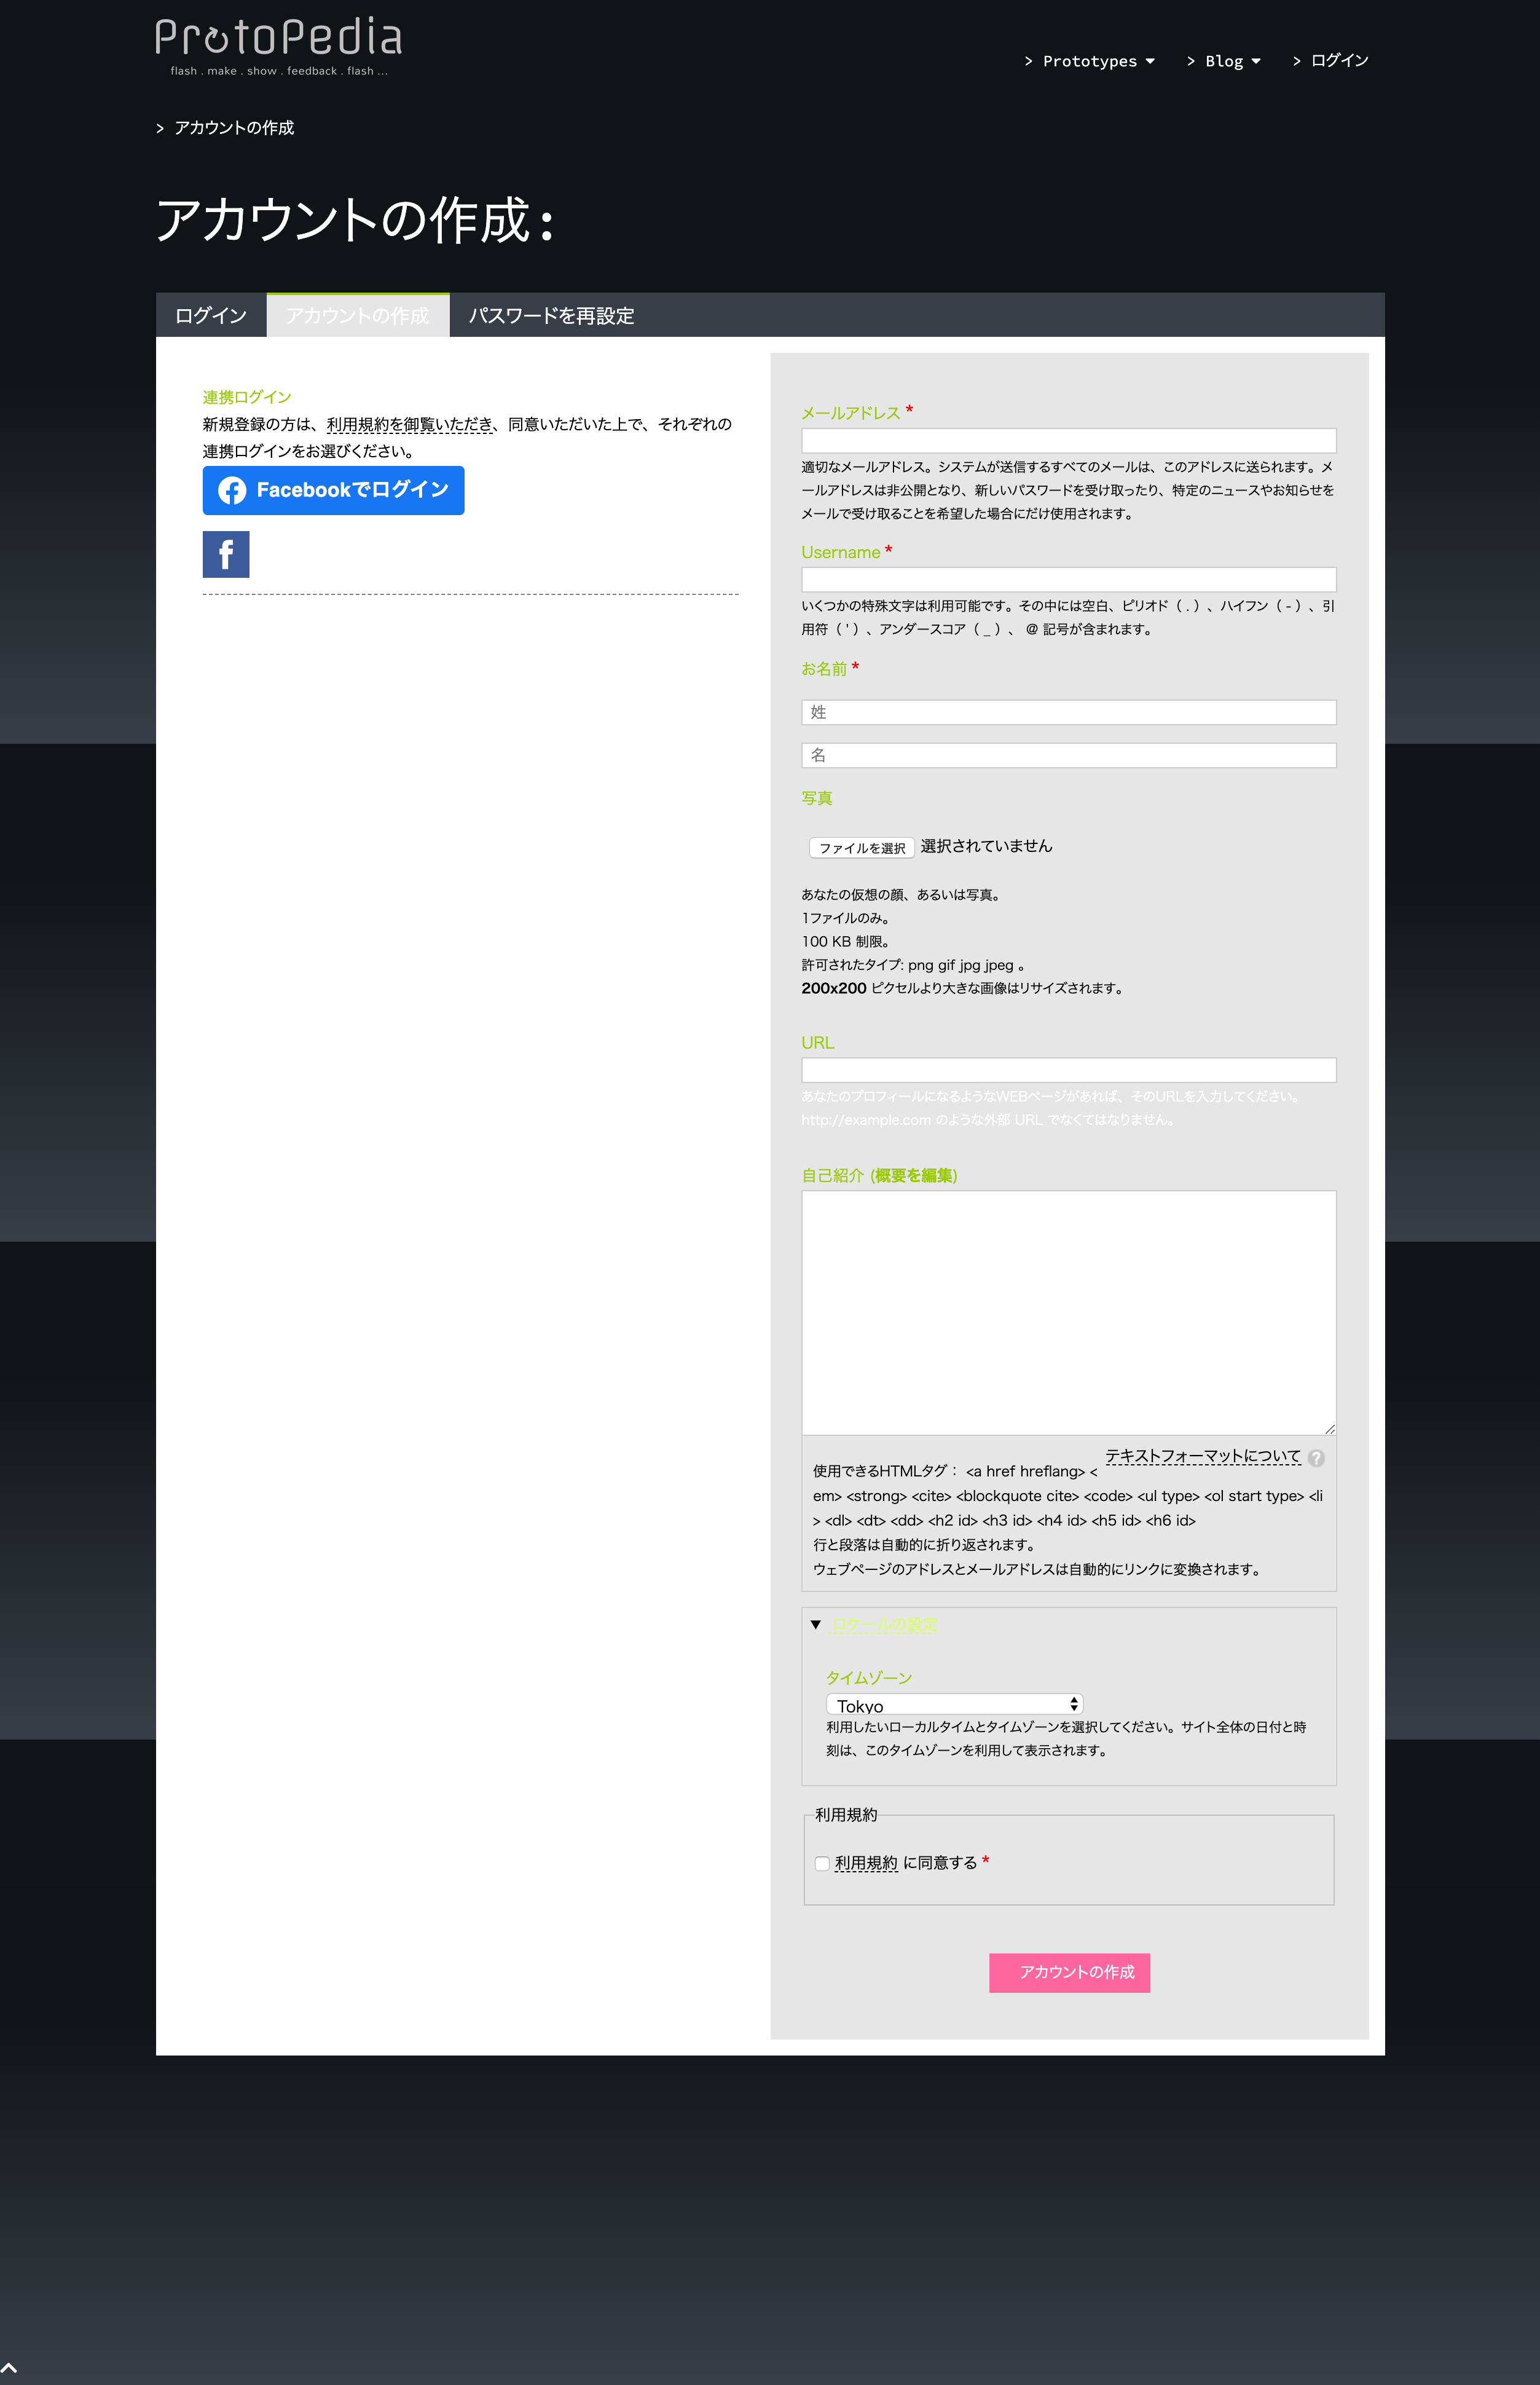 screencapture-protopedia-net-user-register-2020-03-31-10_15_48.png